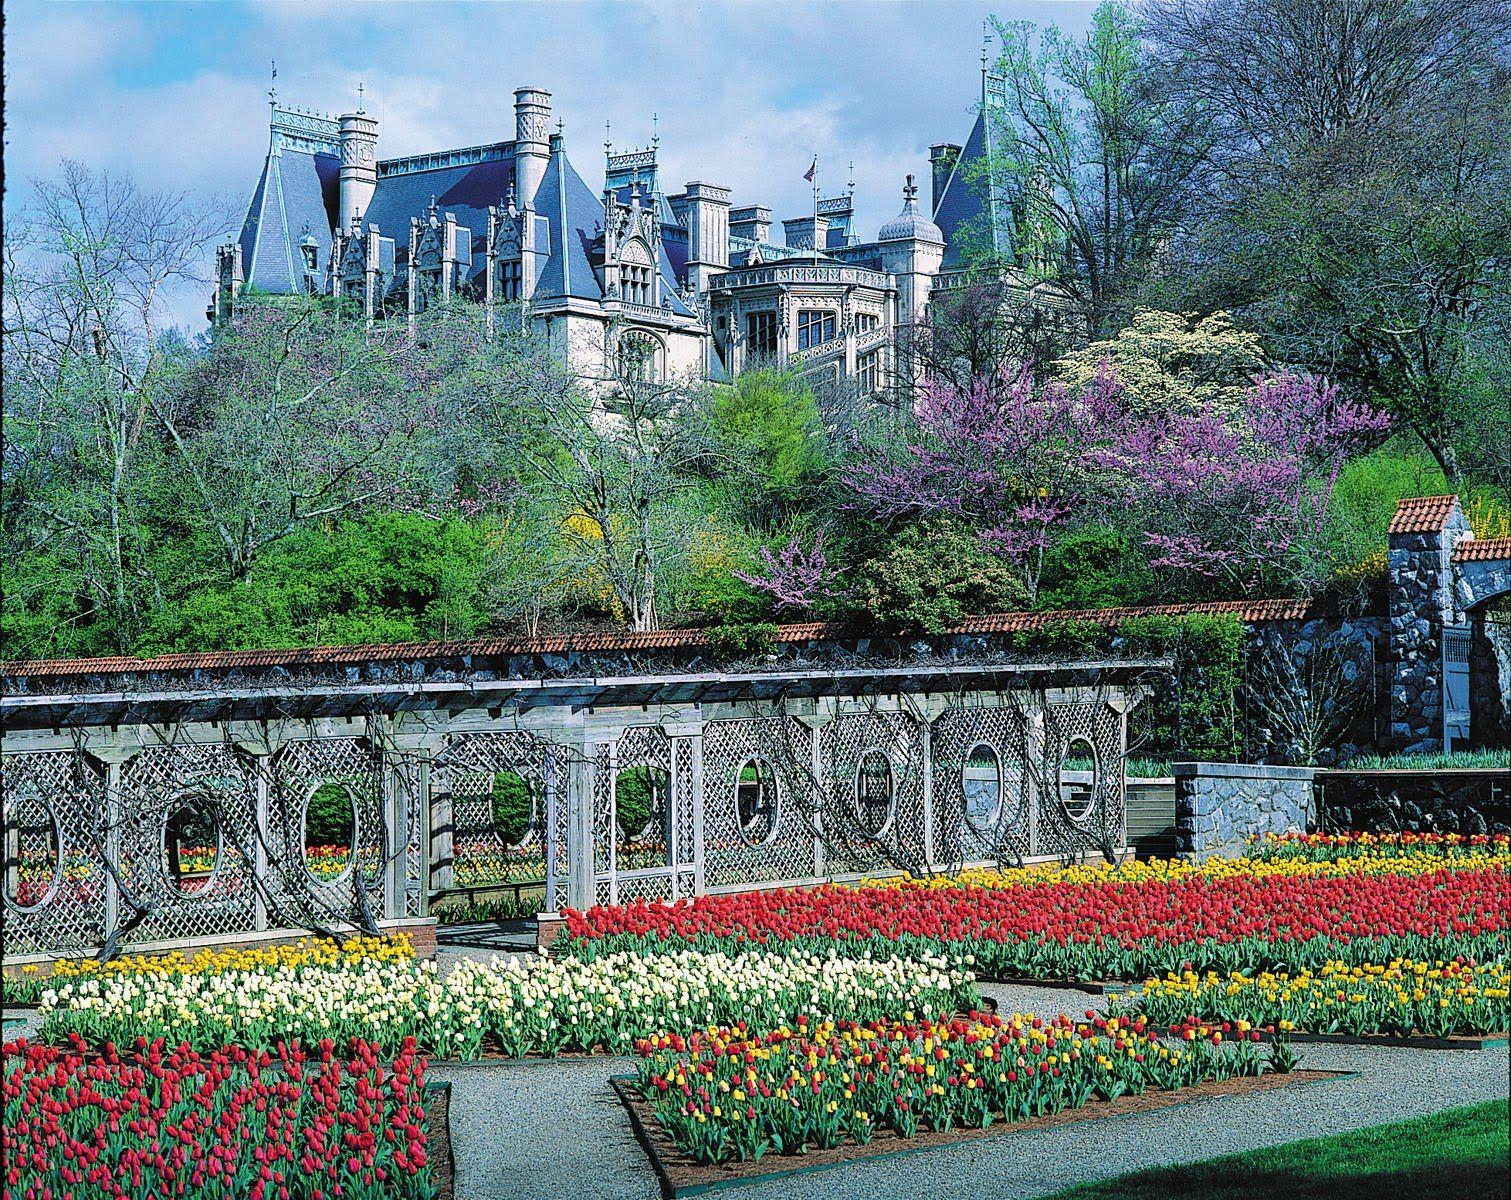 ea268a428fec7228e93e6cc27d473db4 - Can You Visit Biltmore Gardens For Free